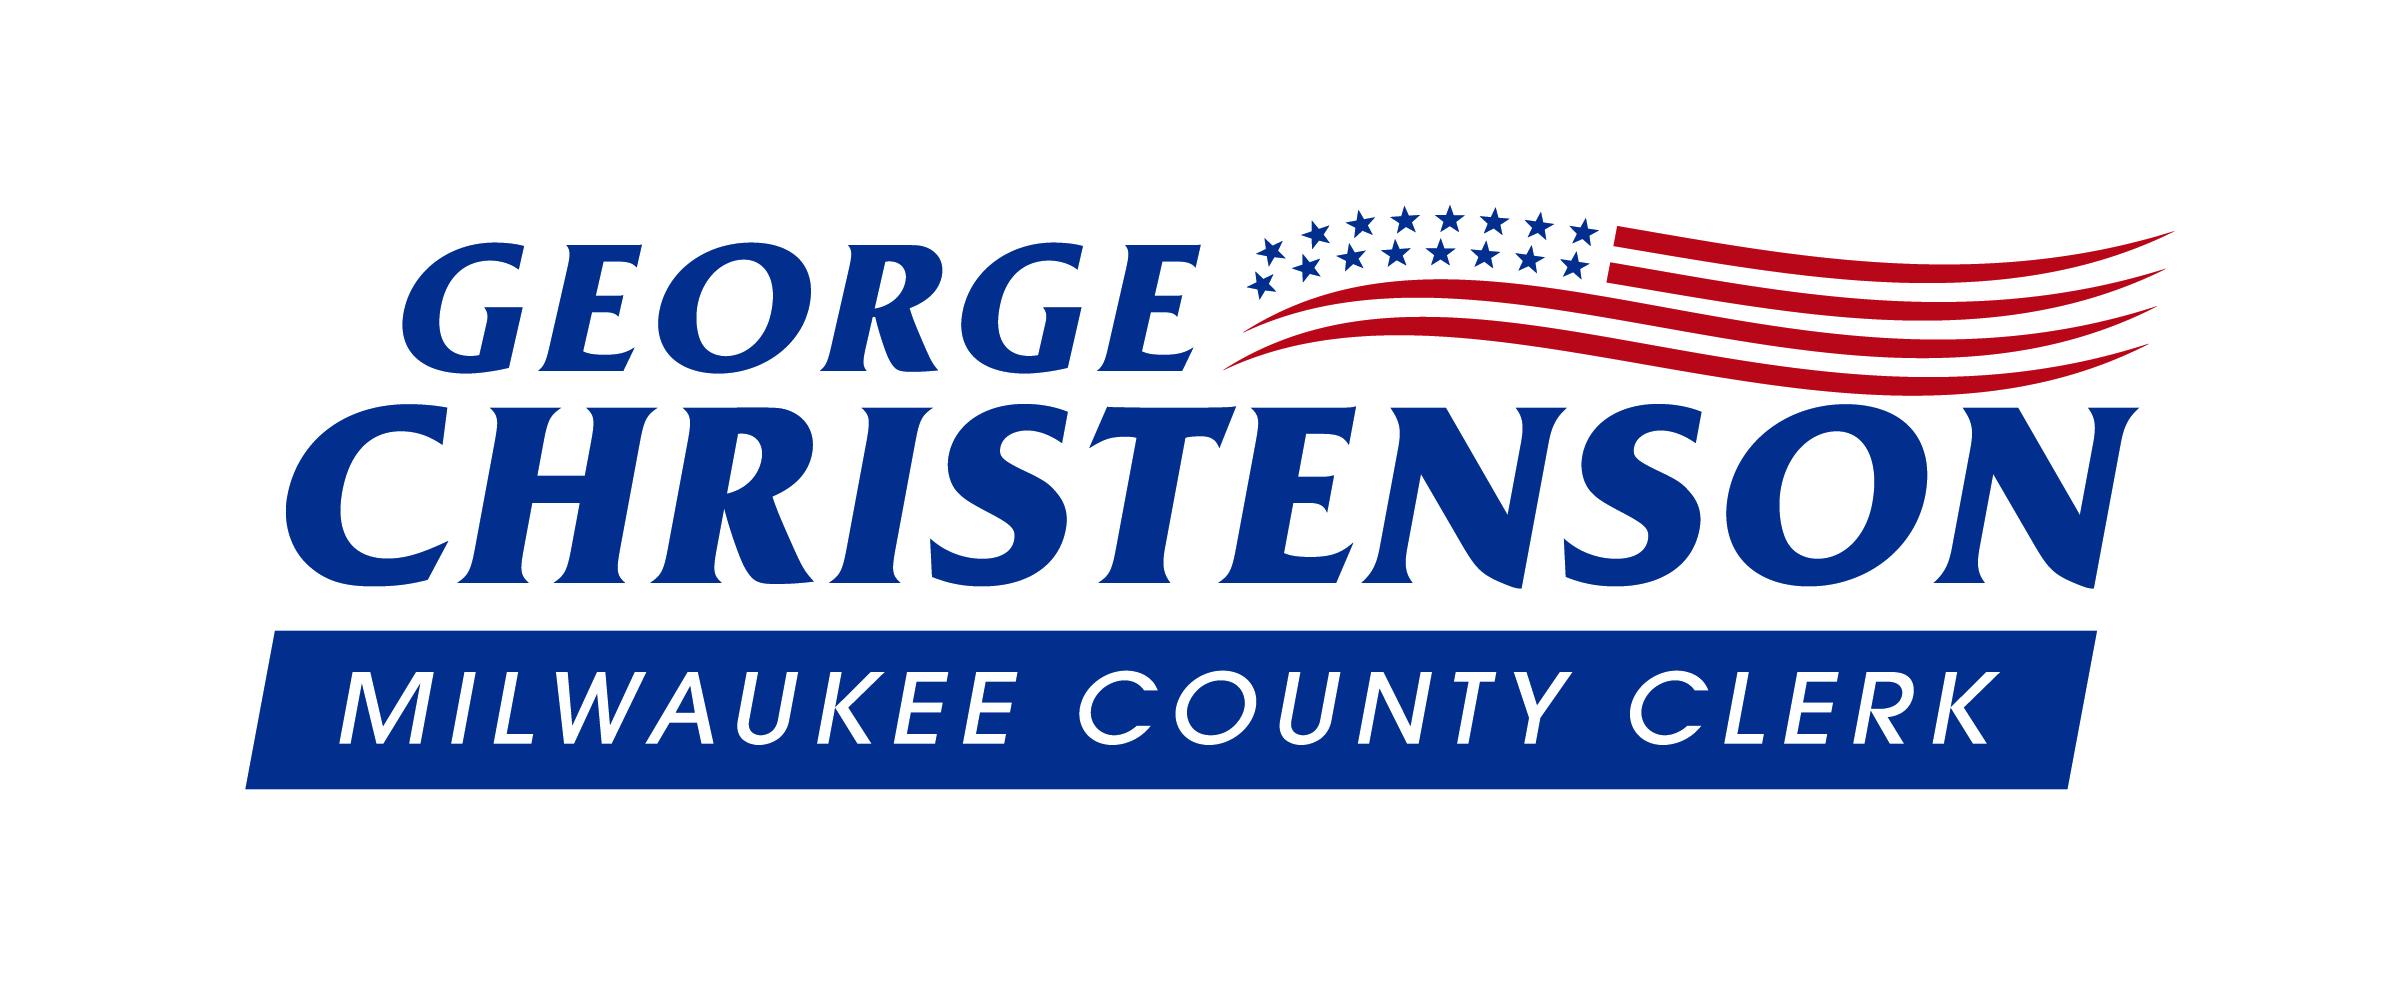 George Christenson